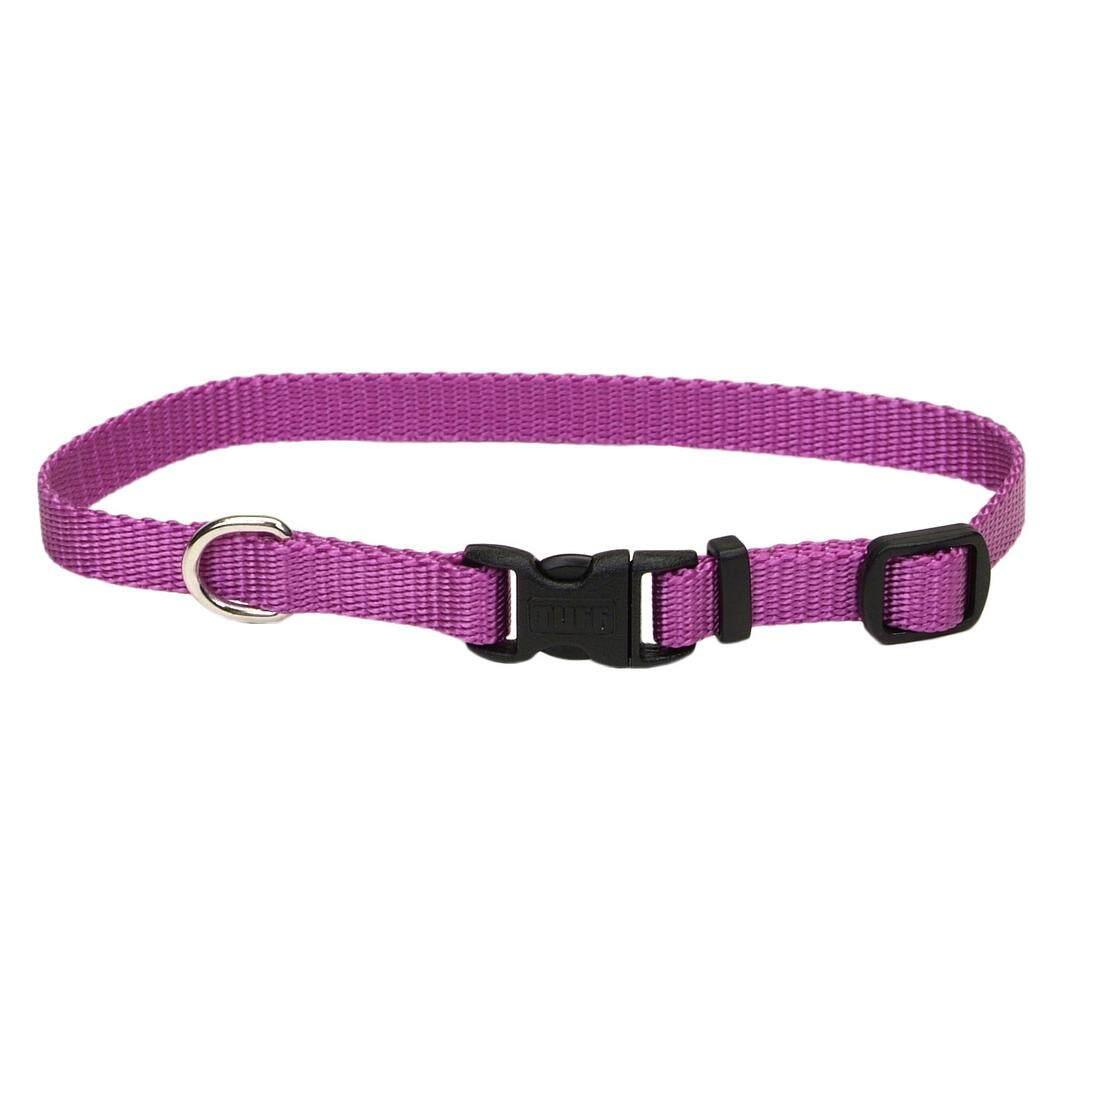 "[Coastal] Adjustable Nylon Dog Collar with Plastic Buckle 5/8"" S - Orchid"